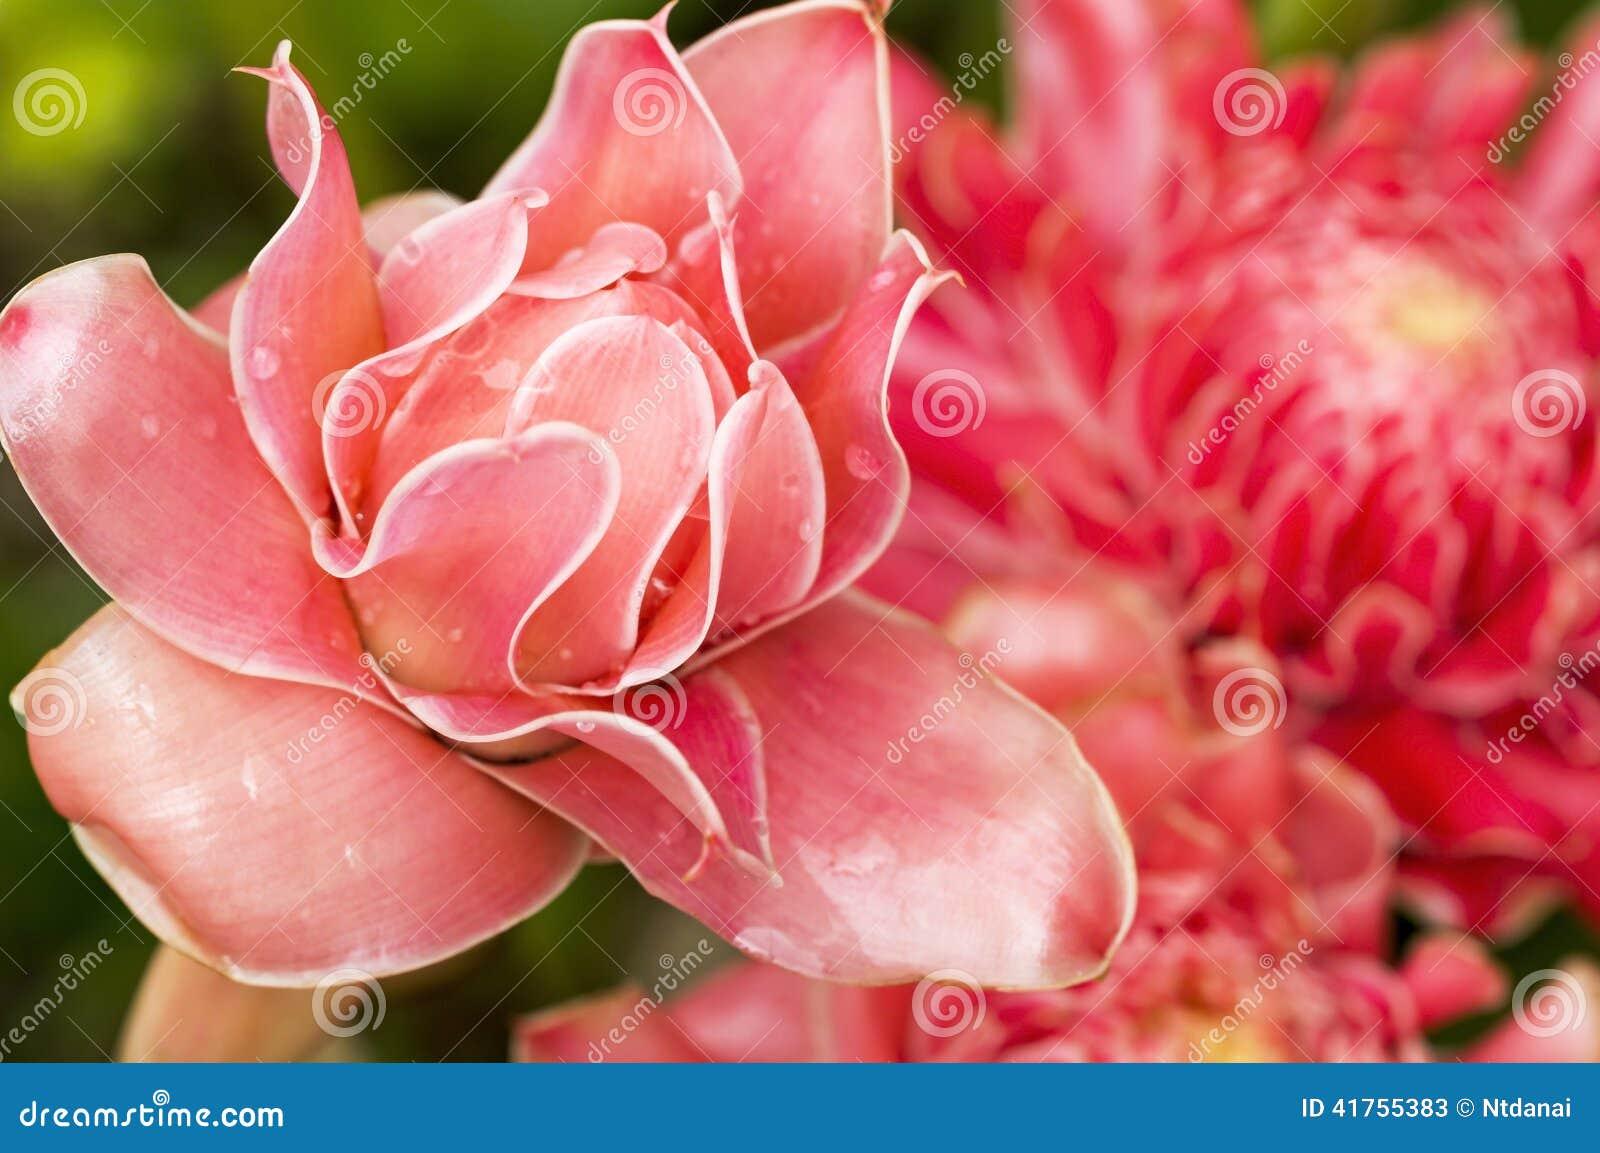 Имбирь  цветы